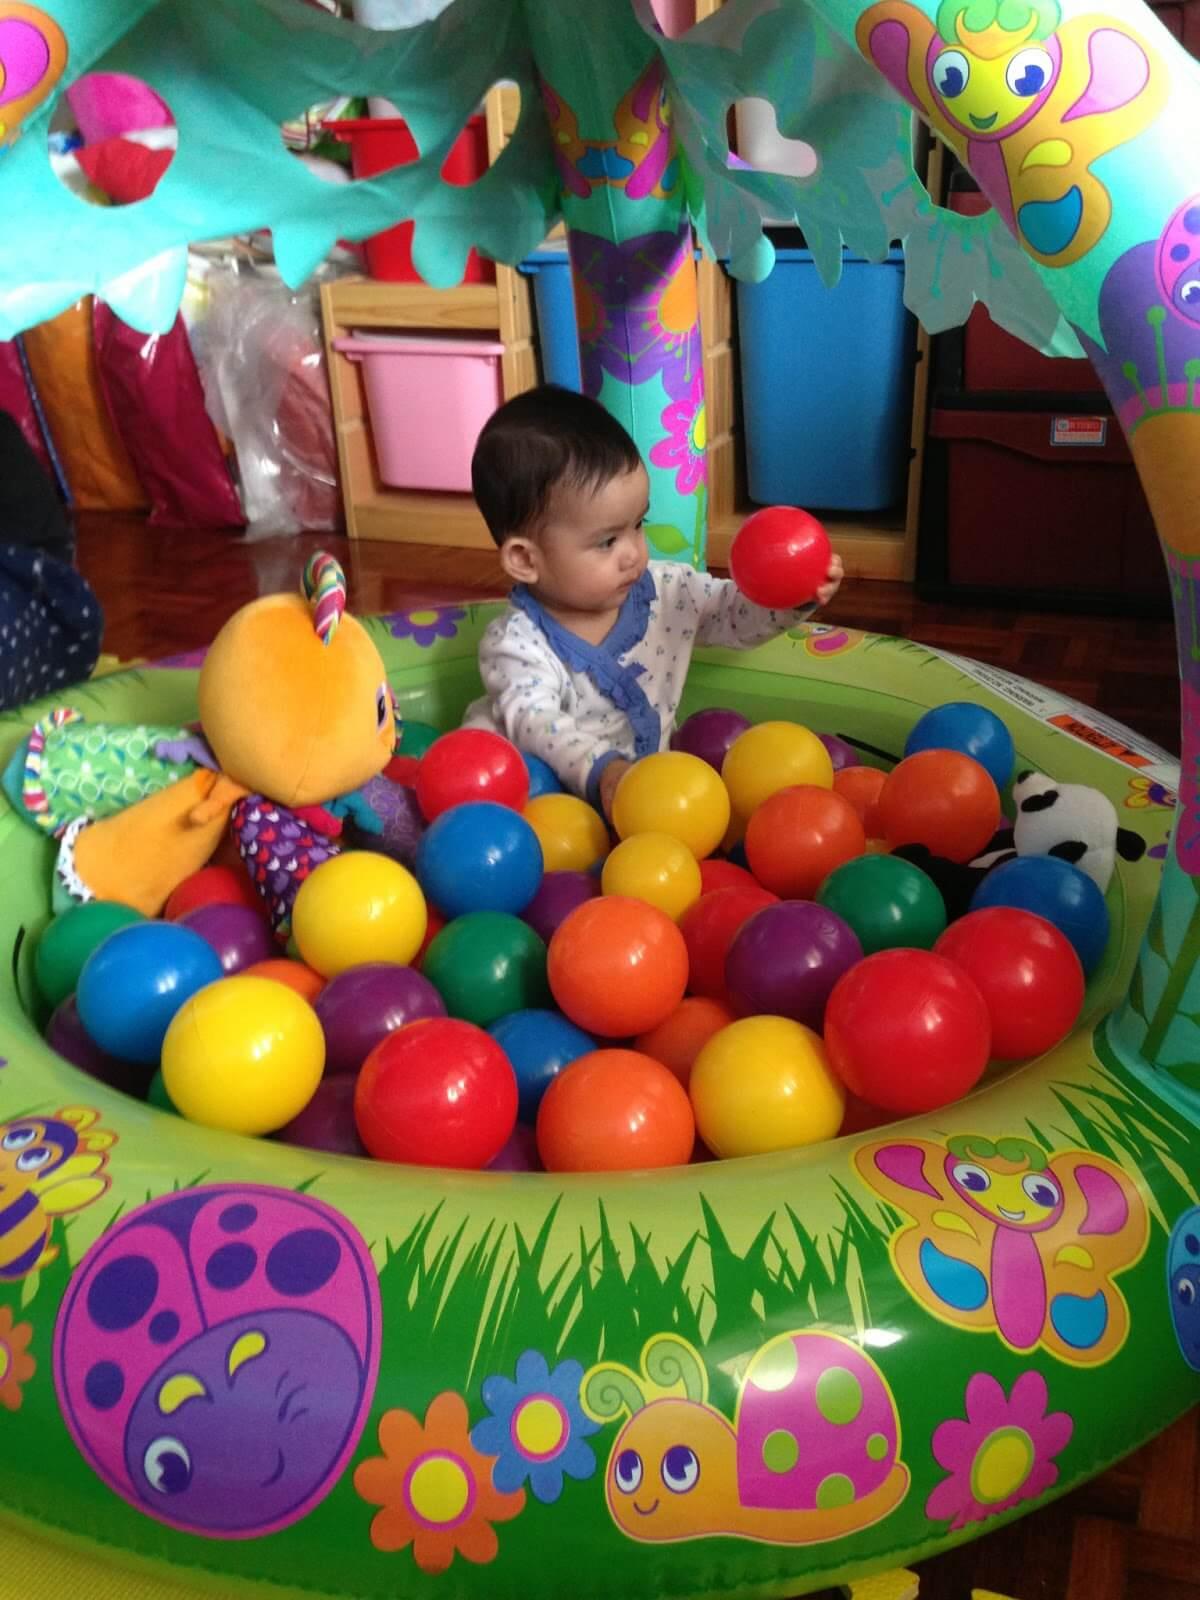 anak cepat bosan dengan mainan